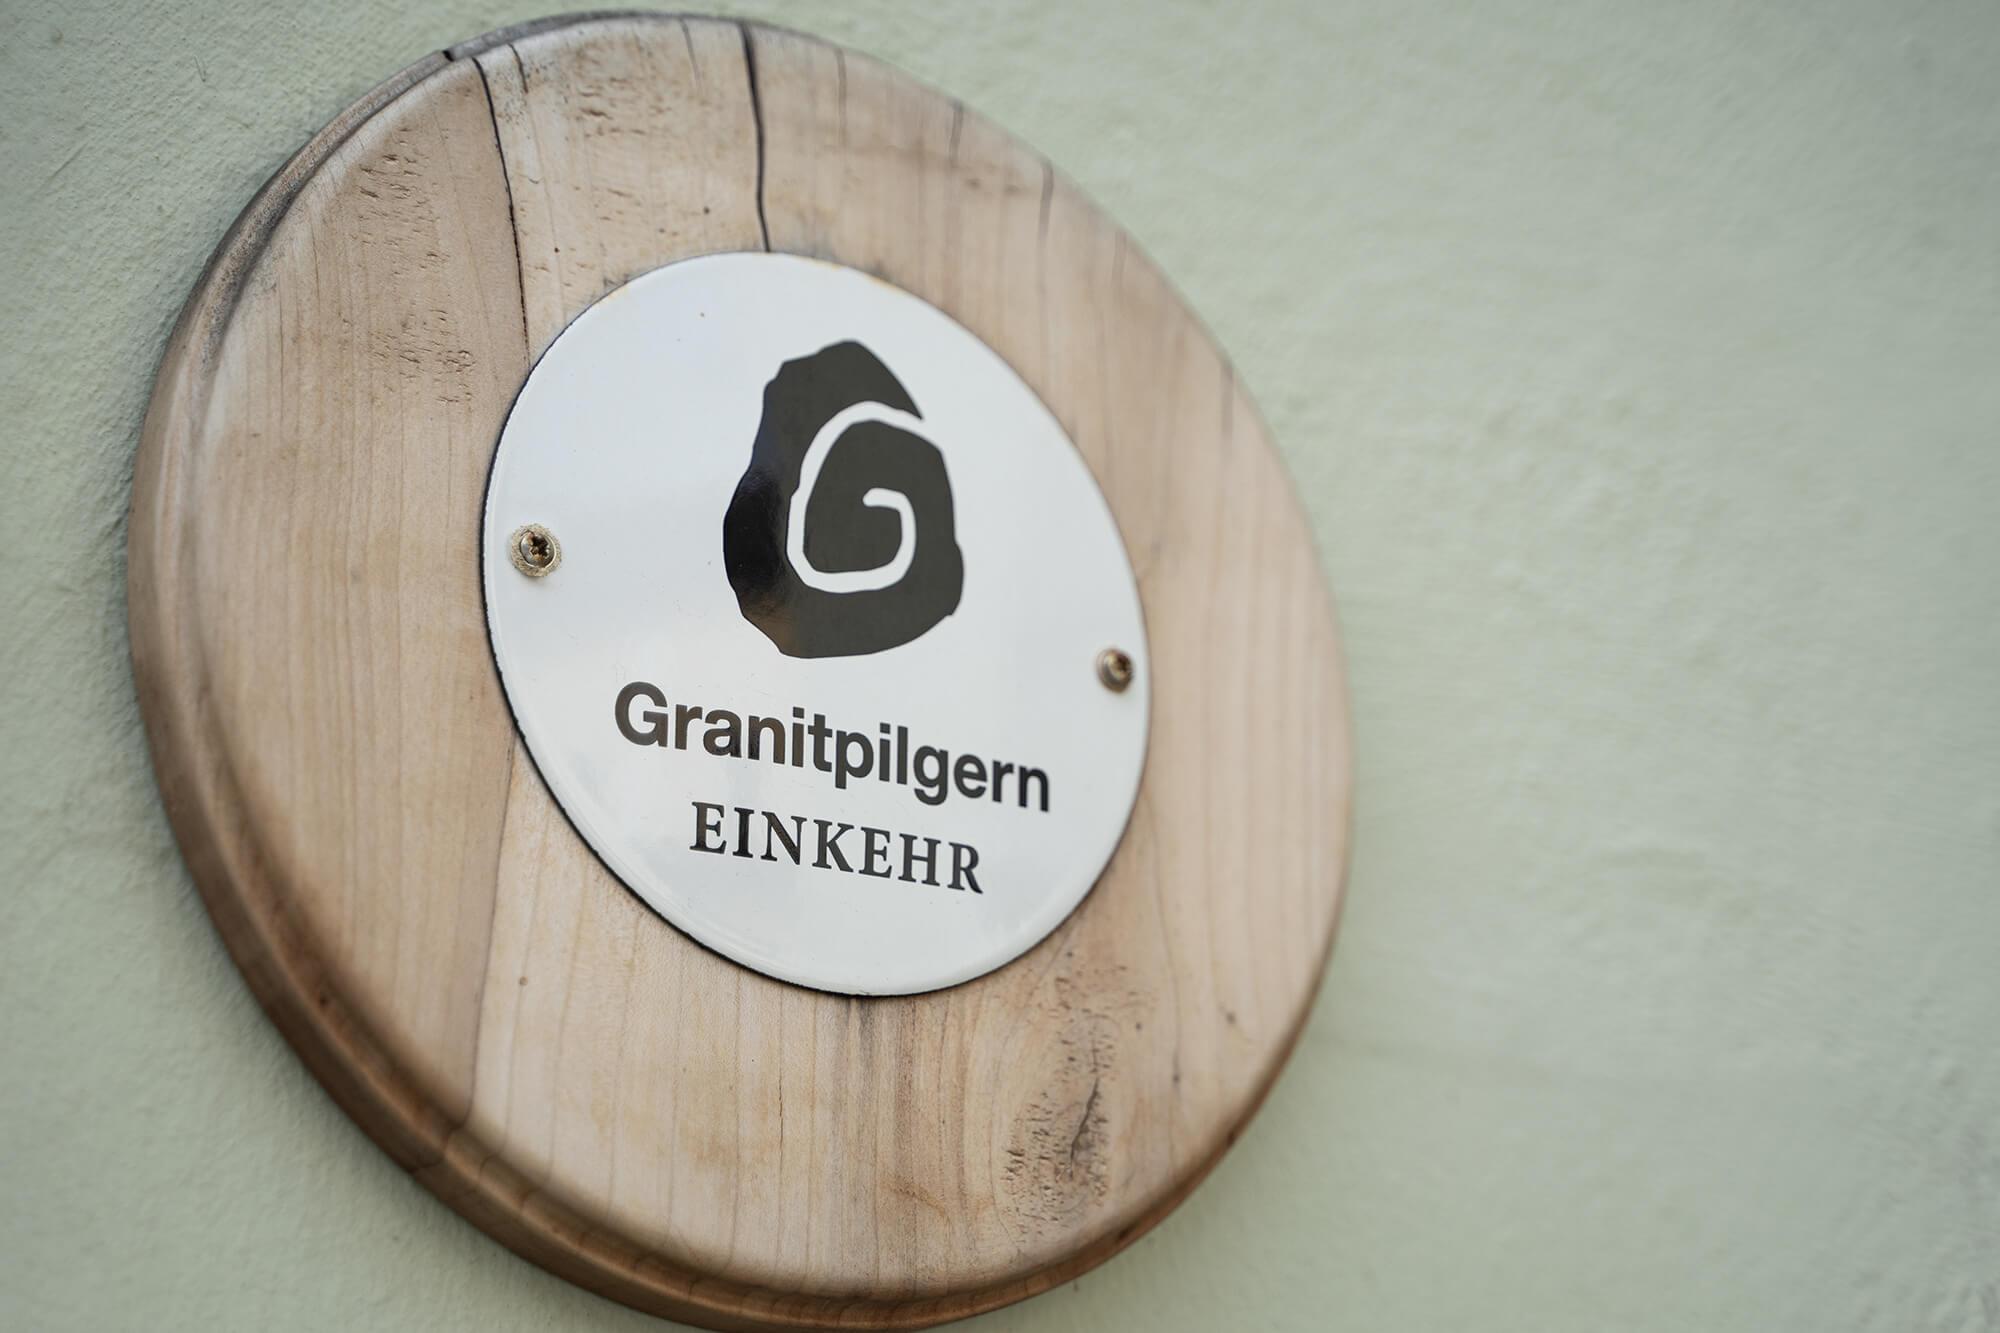 Granitpilgern